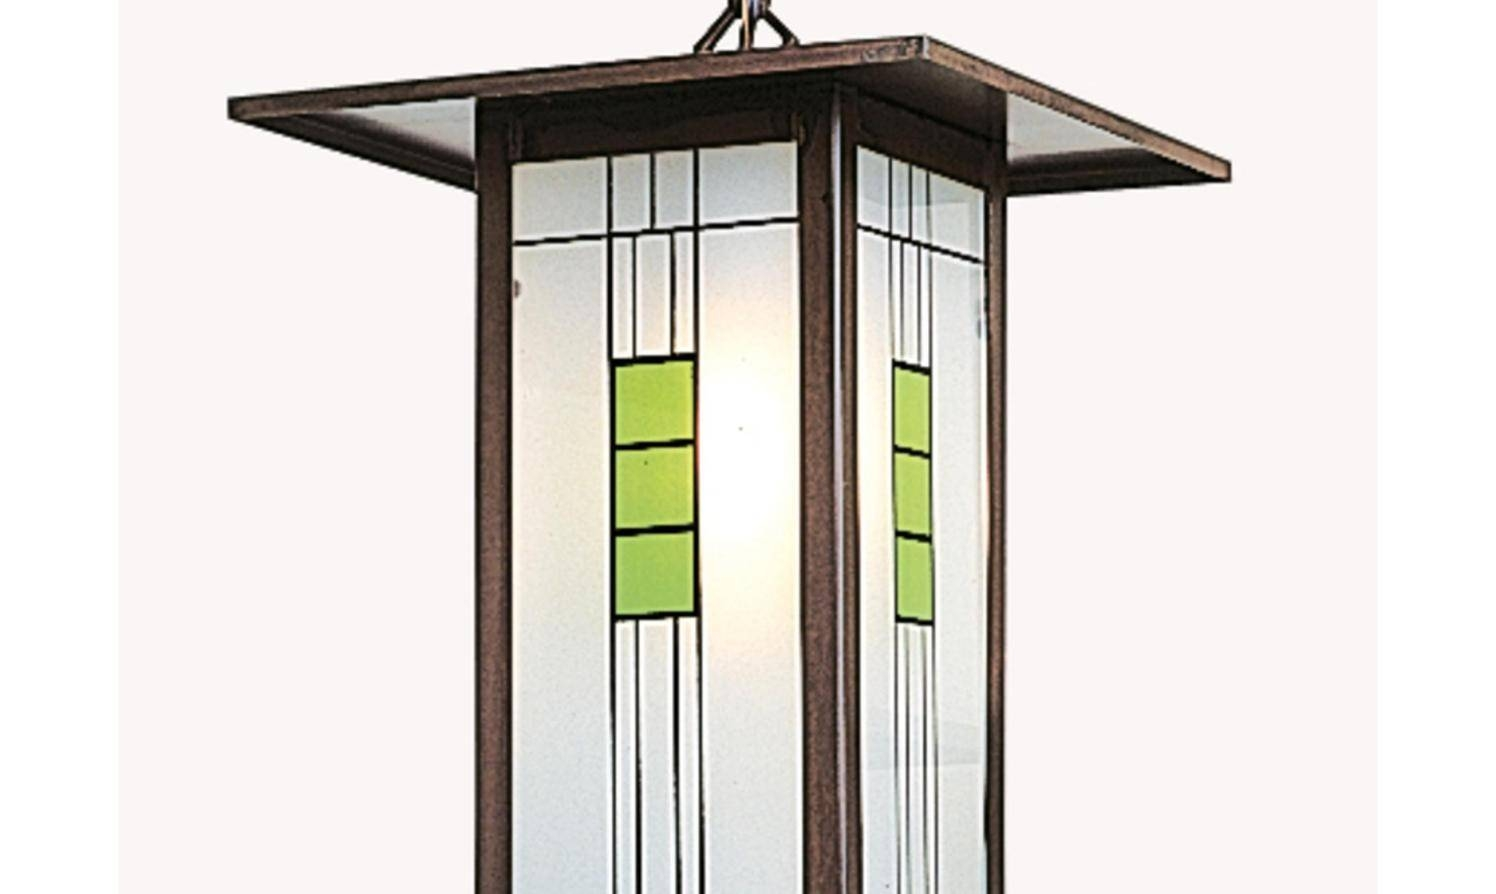 Lighting : Wonderful Seeded Glass Pendant Light Wonderful Pendant regarding Vancouver Pendant Lighting (Image 9 of 15)